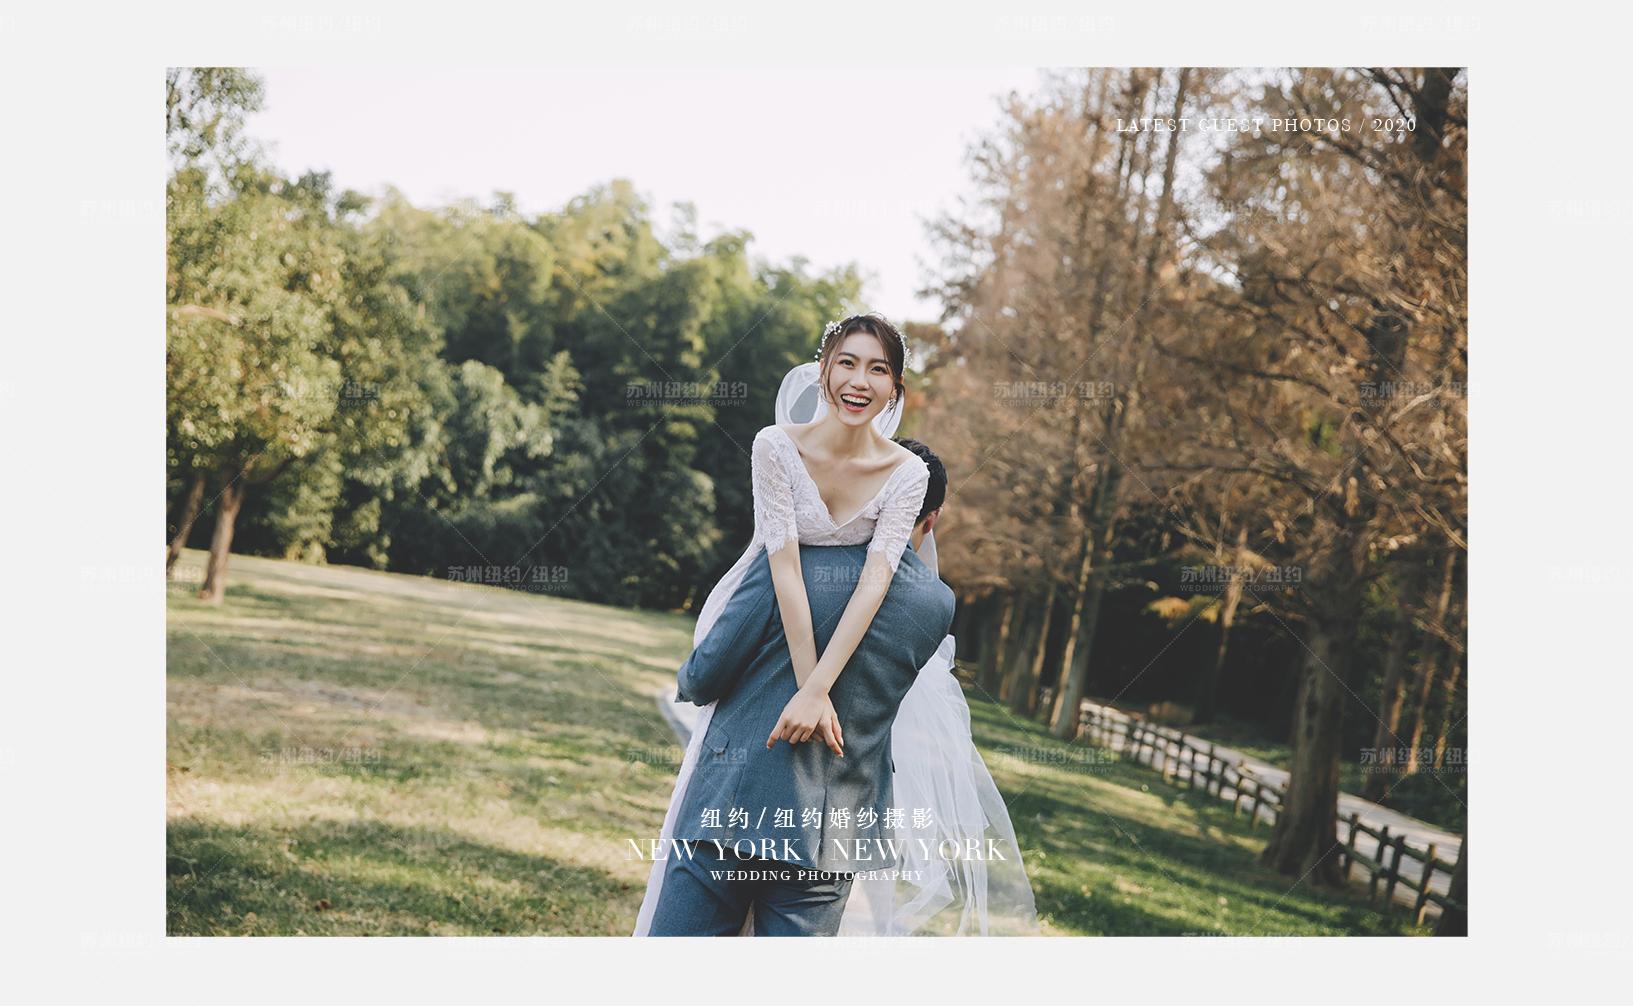 Mr.朱 & Ms.朱(纽约纽约最新客照)婚纱摄影照